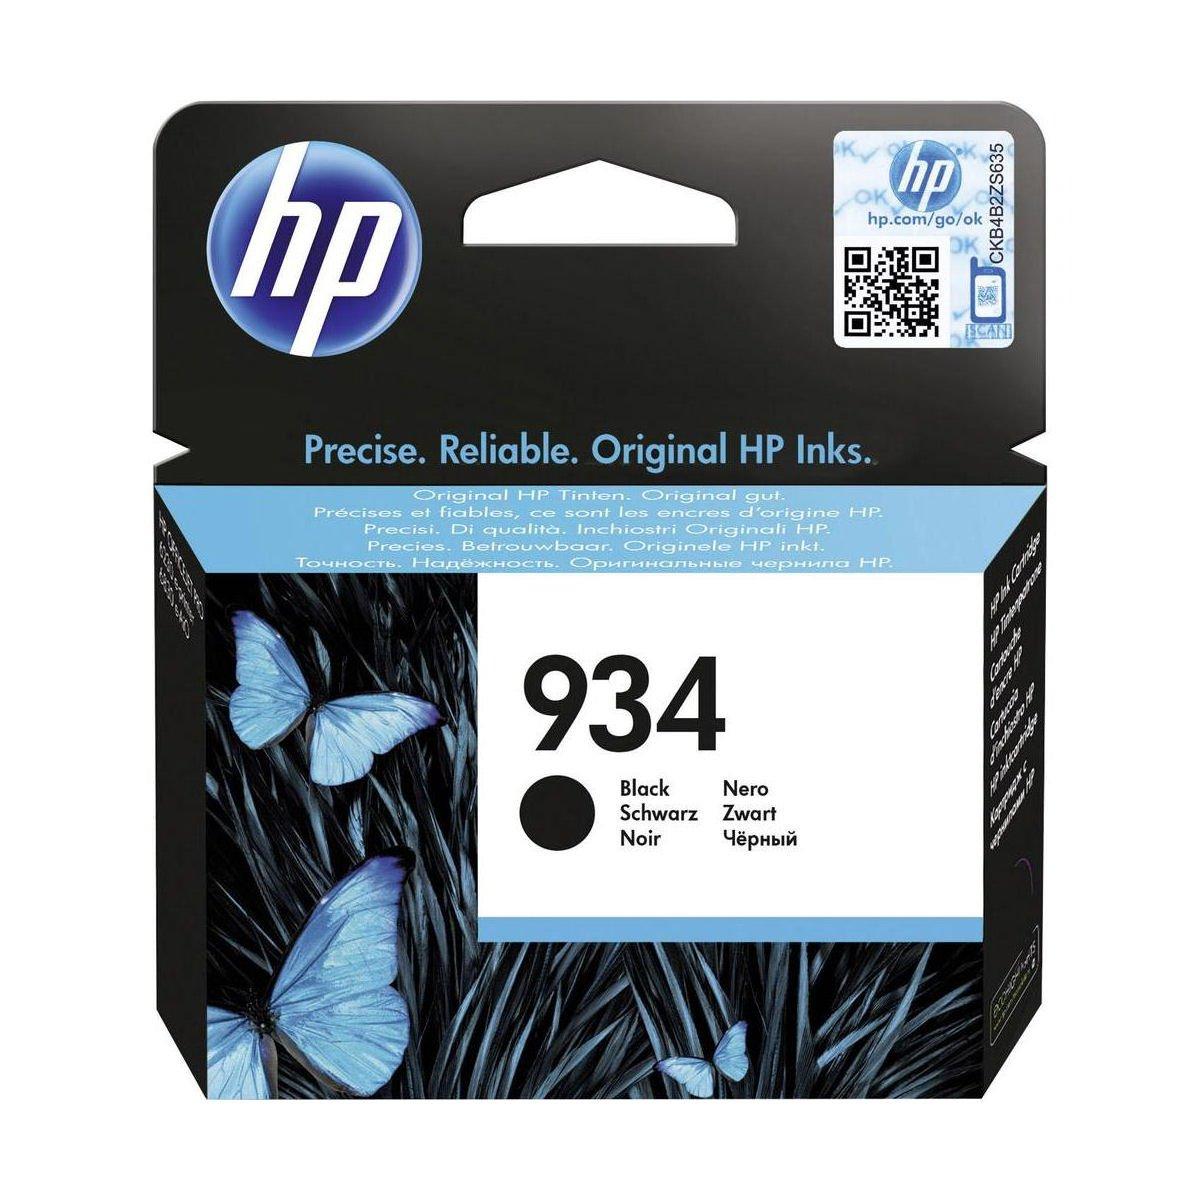 Hewlett Packard [HP] No. 934 Inkjet Cartridge Black Ref C2P19AE